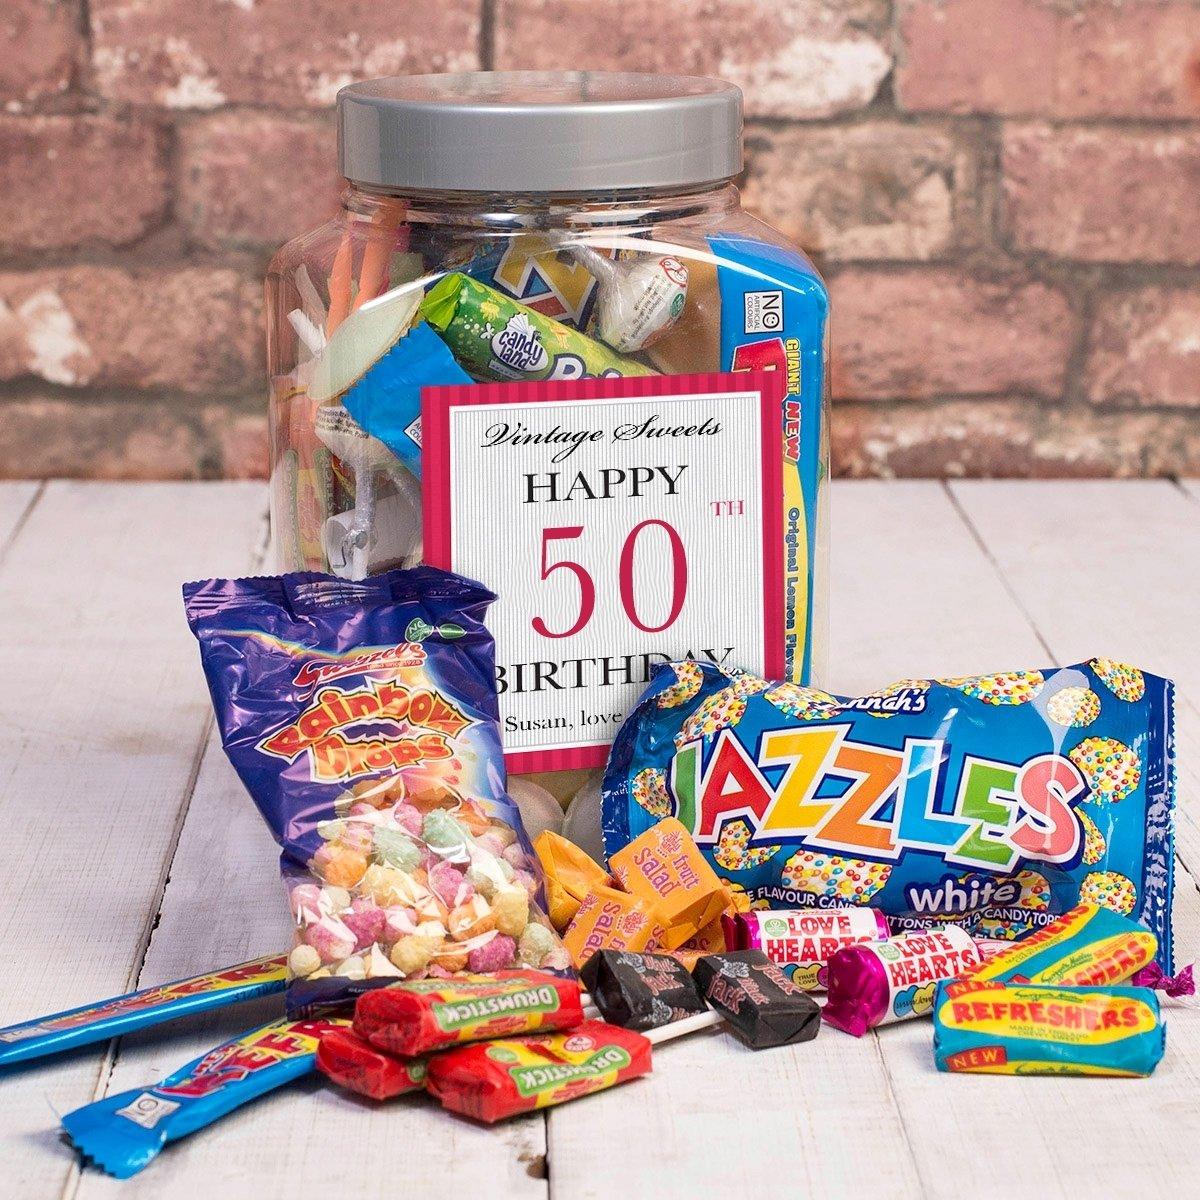 10 Fabulous 50Th Birthday Ideas For Wife personalised retro sweet jar happy 50th birthday gettingpersonal 1